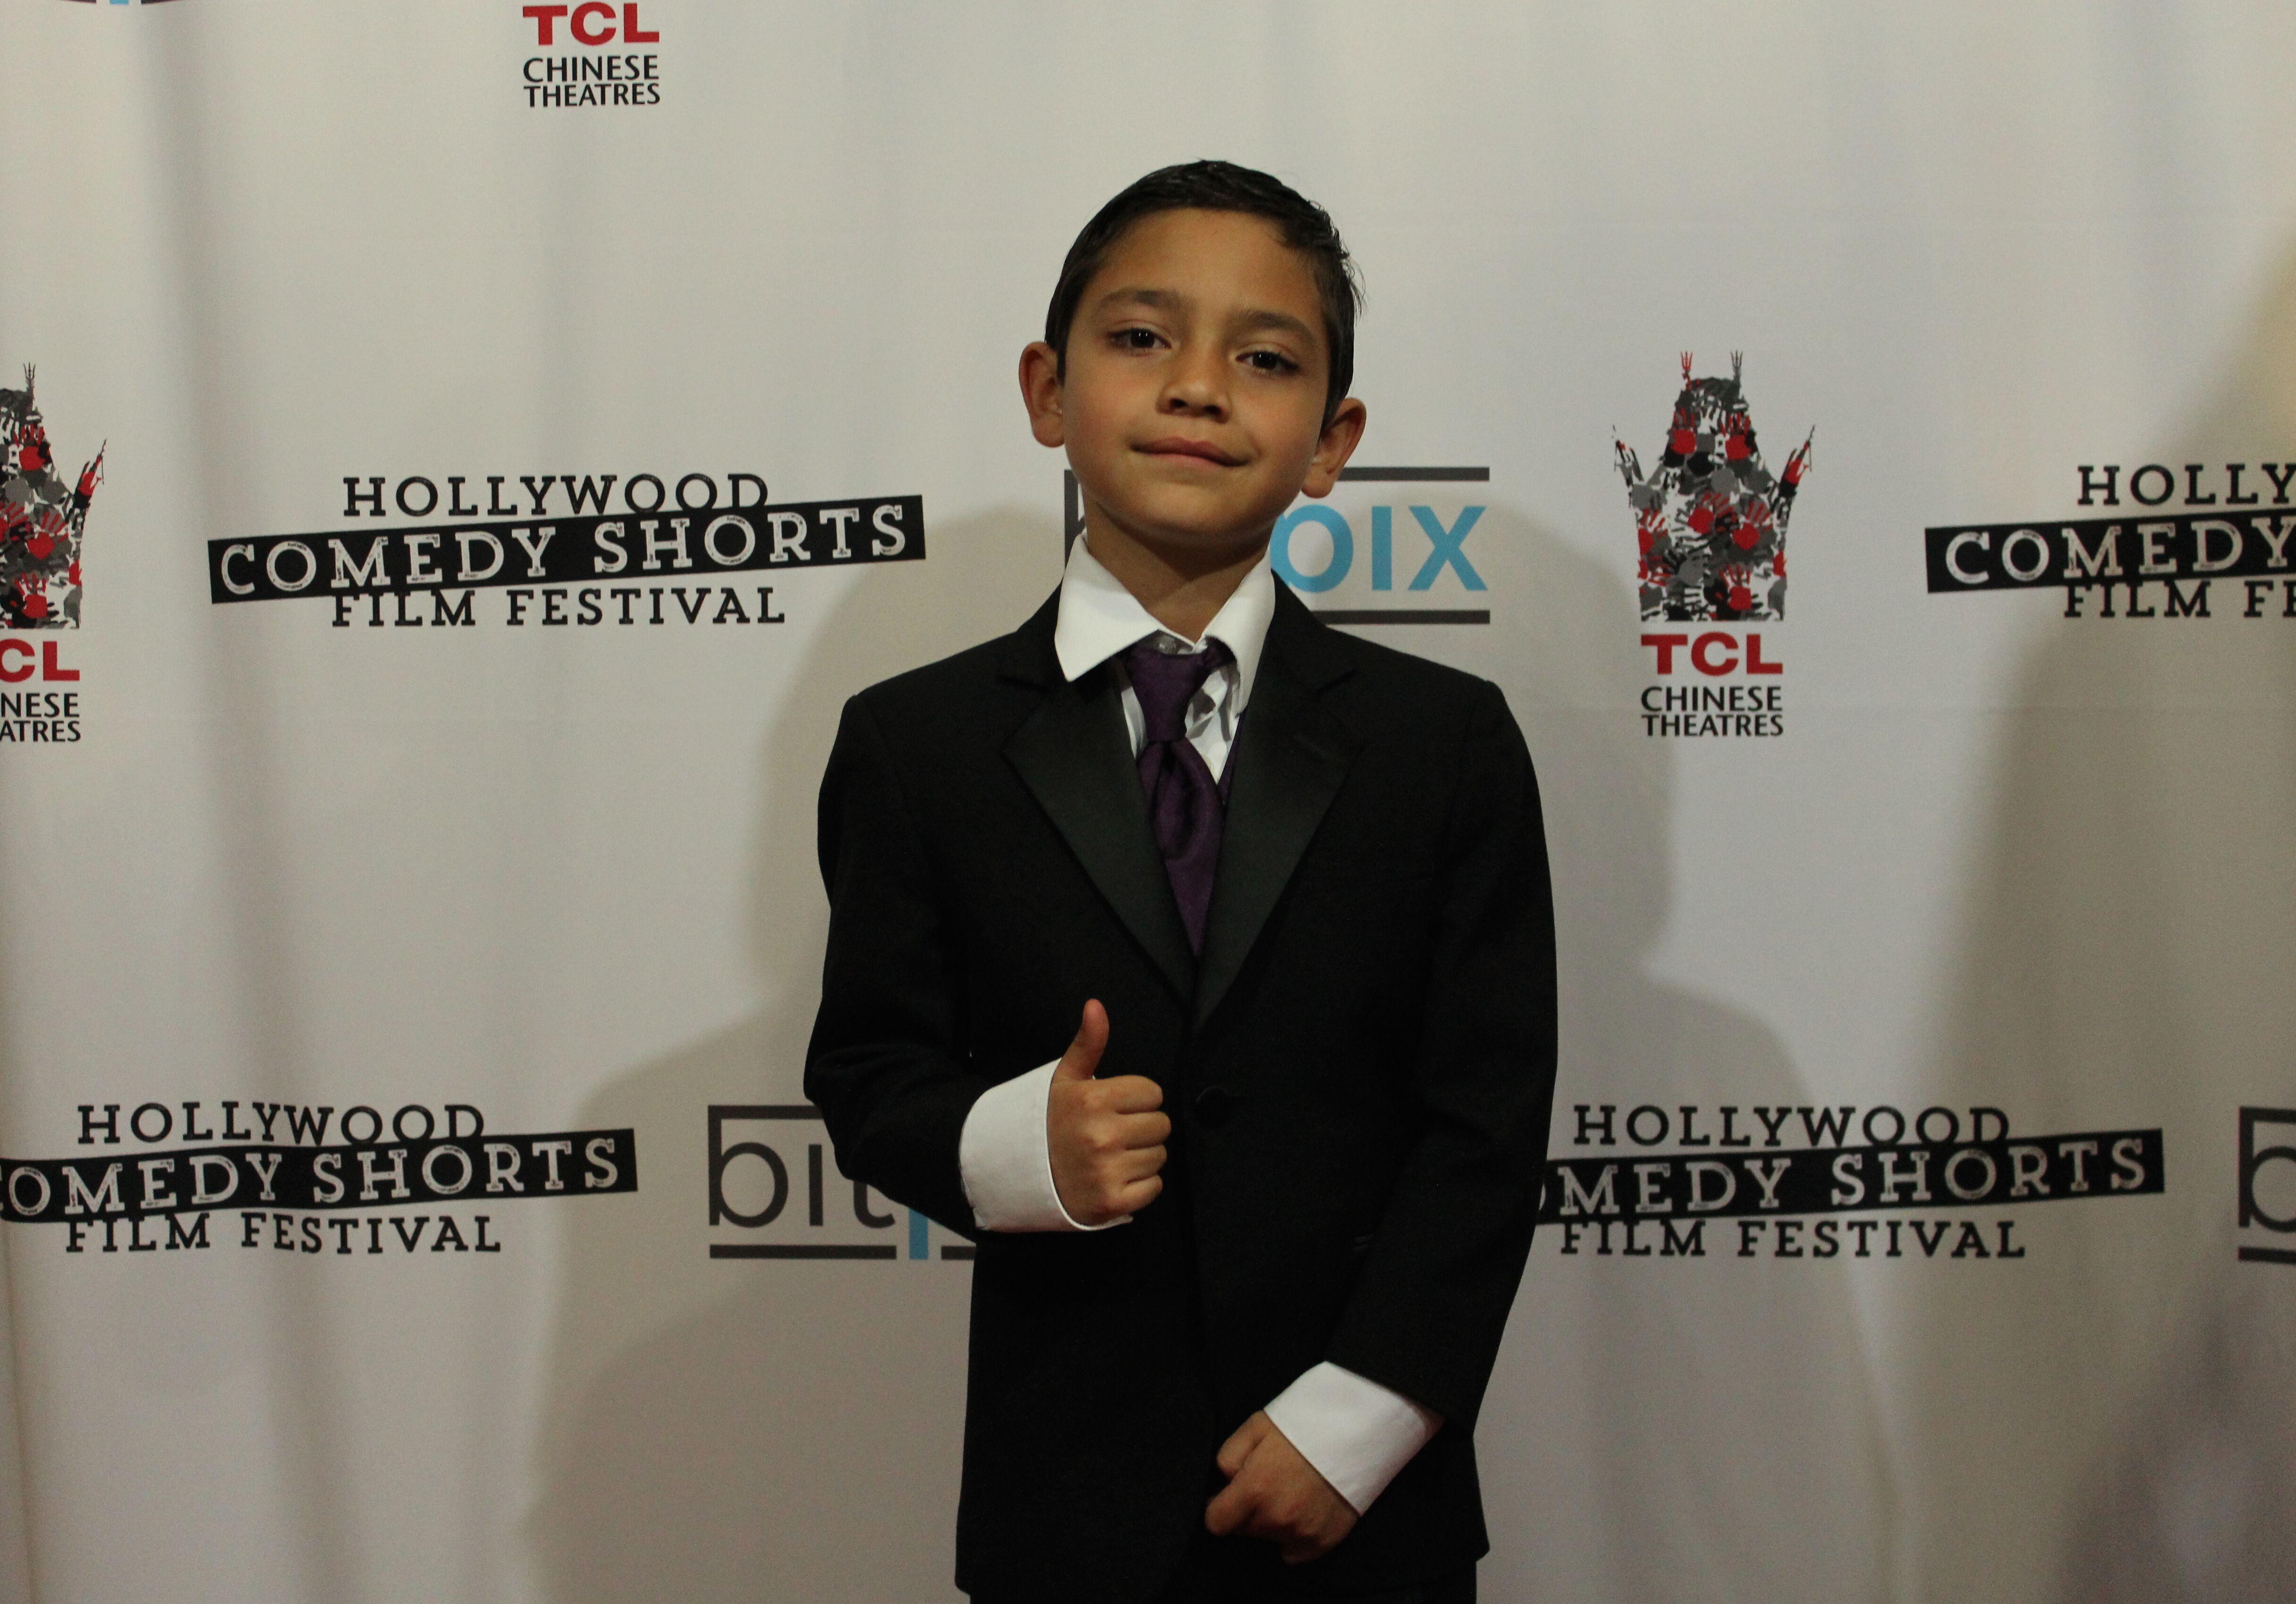 b551e3440 comedy pic 1.jpg comedy pic 7.jpg. The inaugural Hollywood Comedy Shorts  Film ...